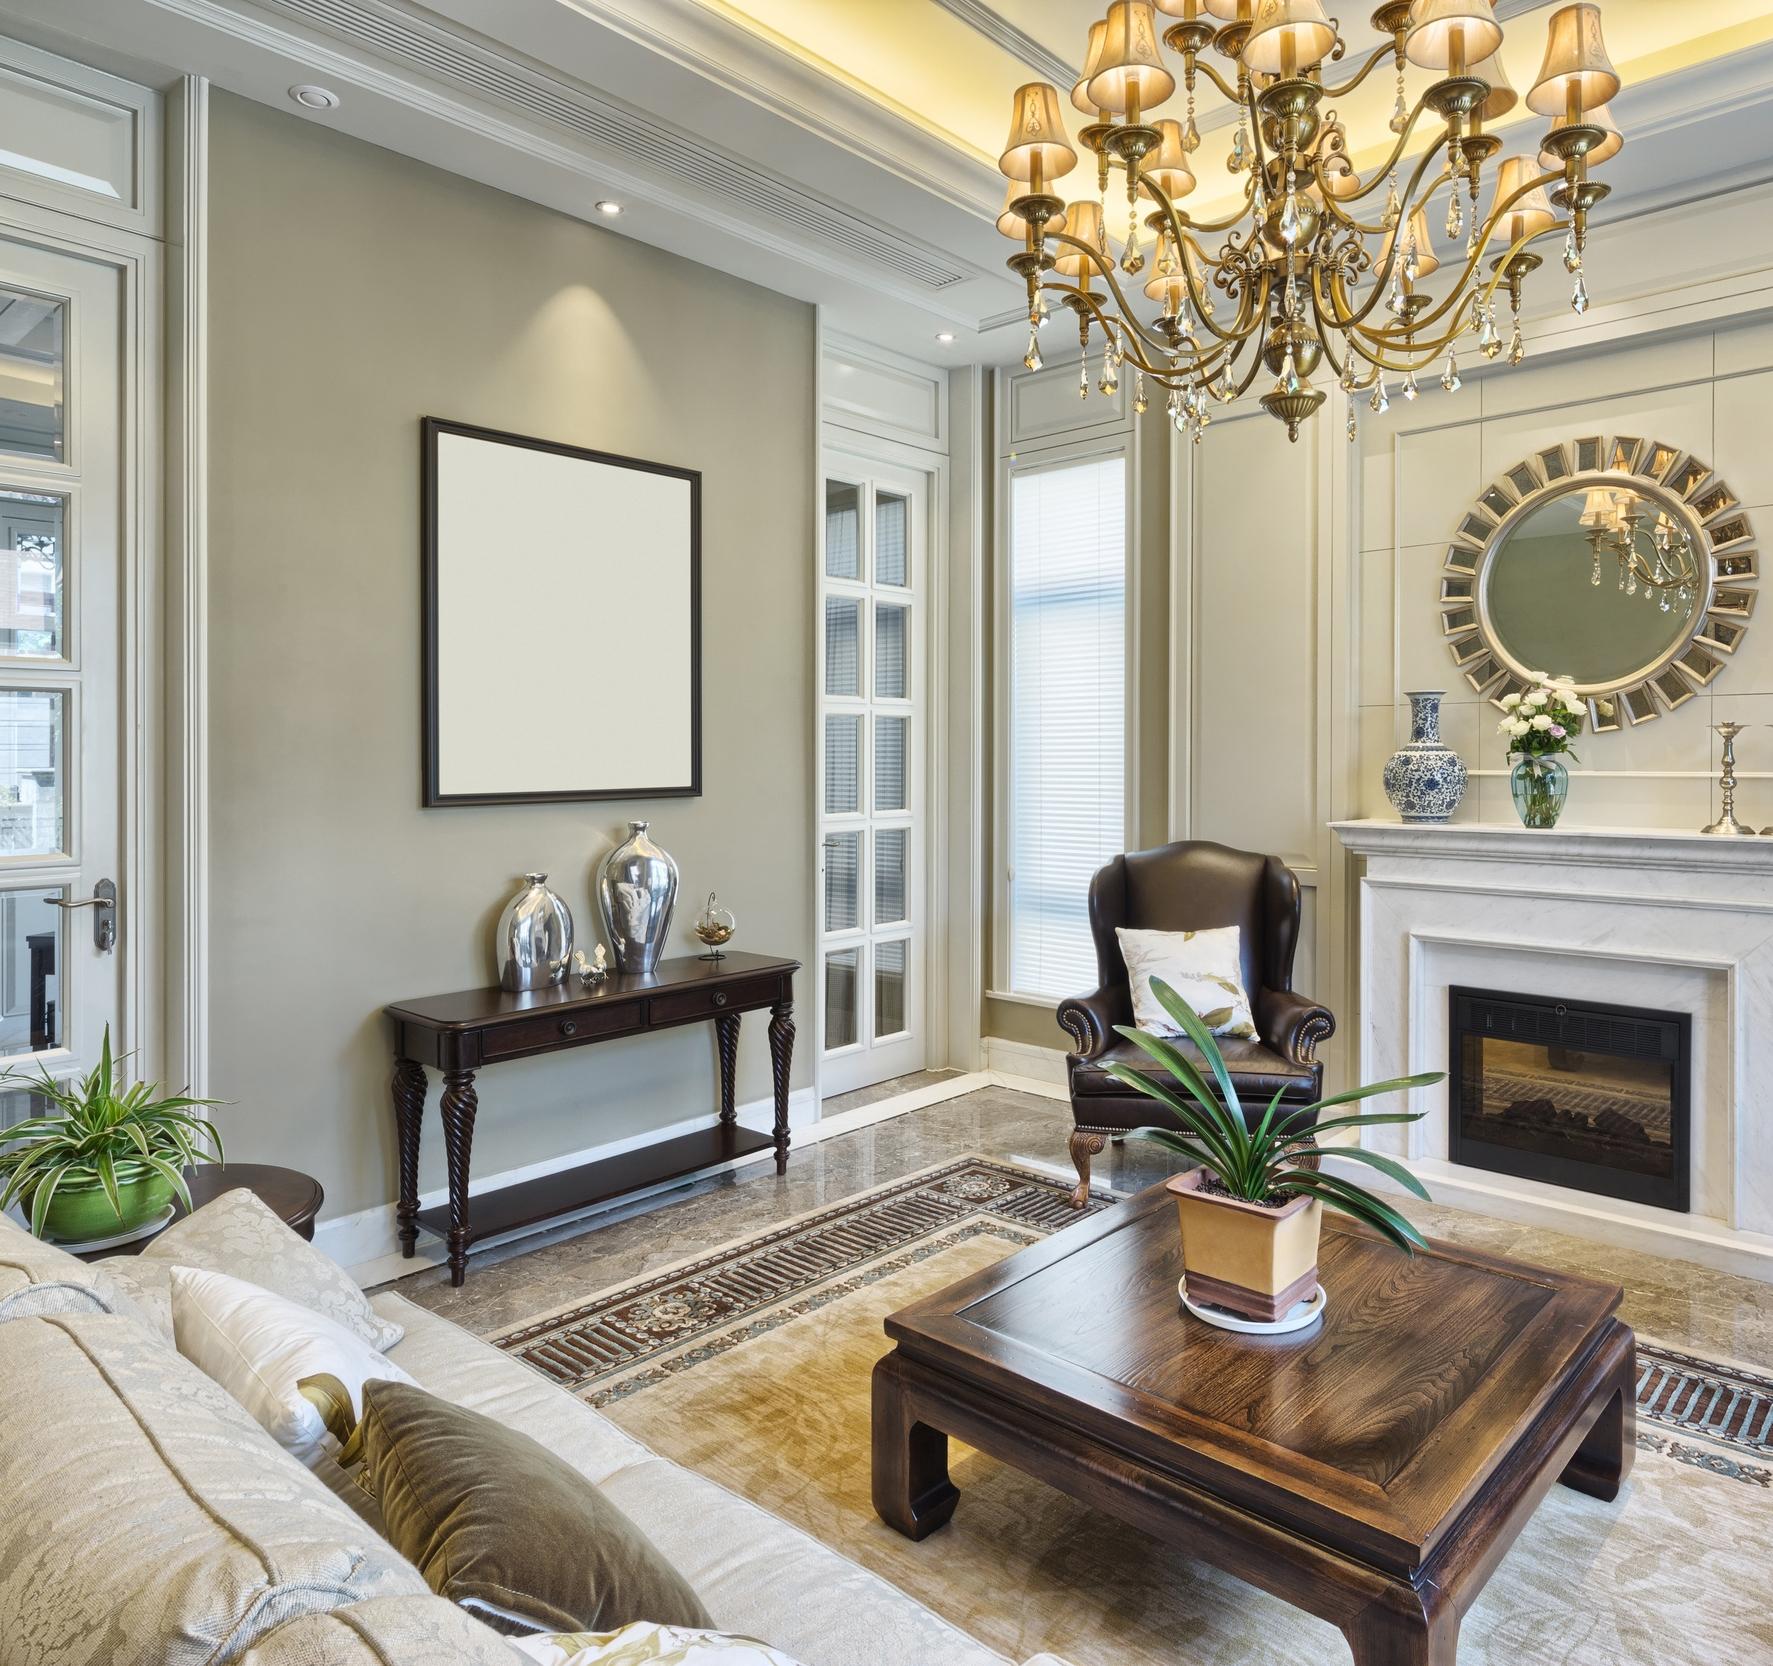 inspiring-home-interior-decor-florida-designer-spectacular-spaces-86387293.jpg